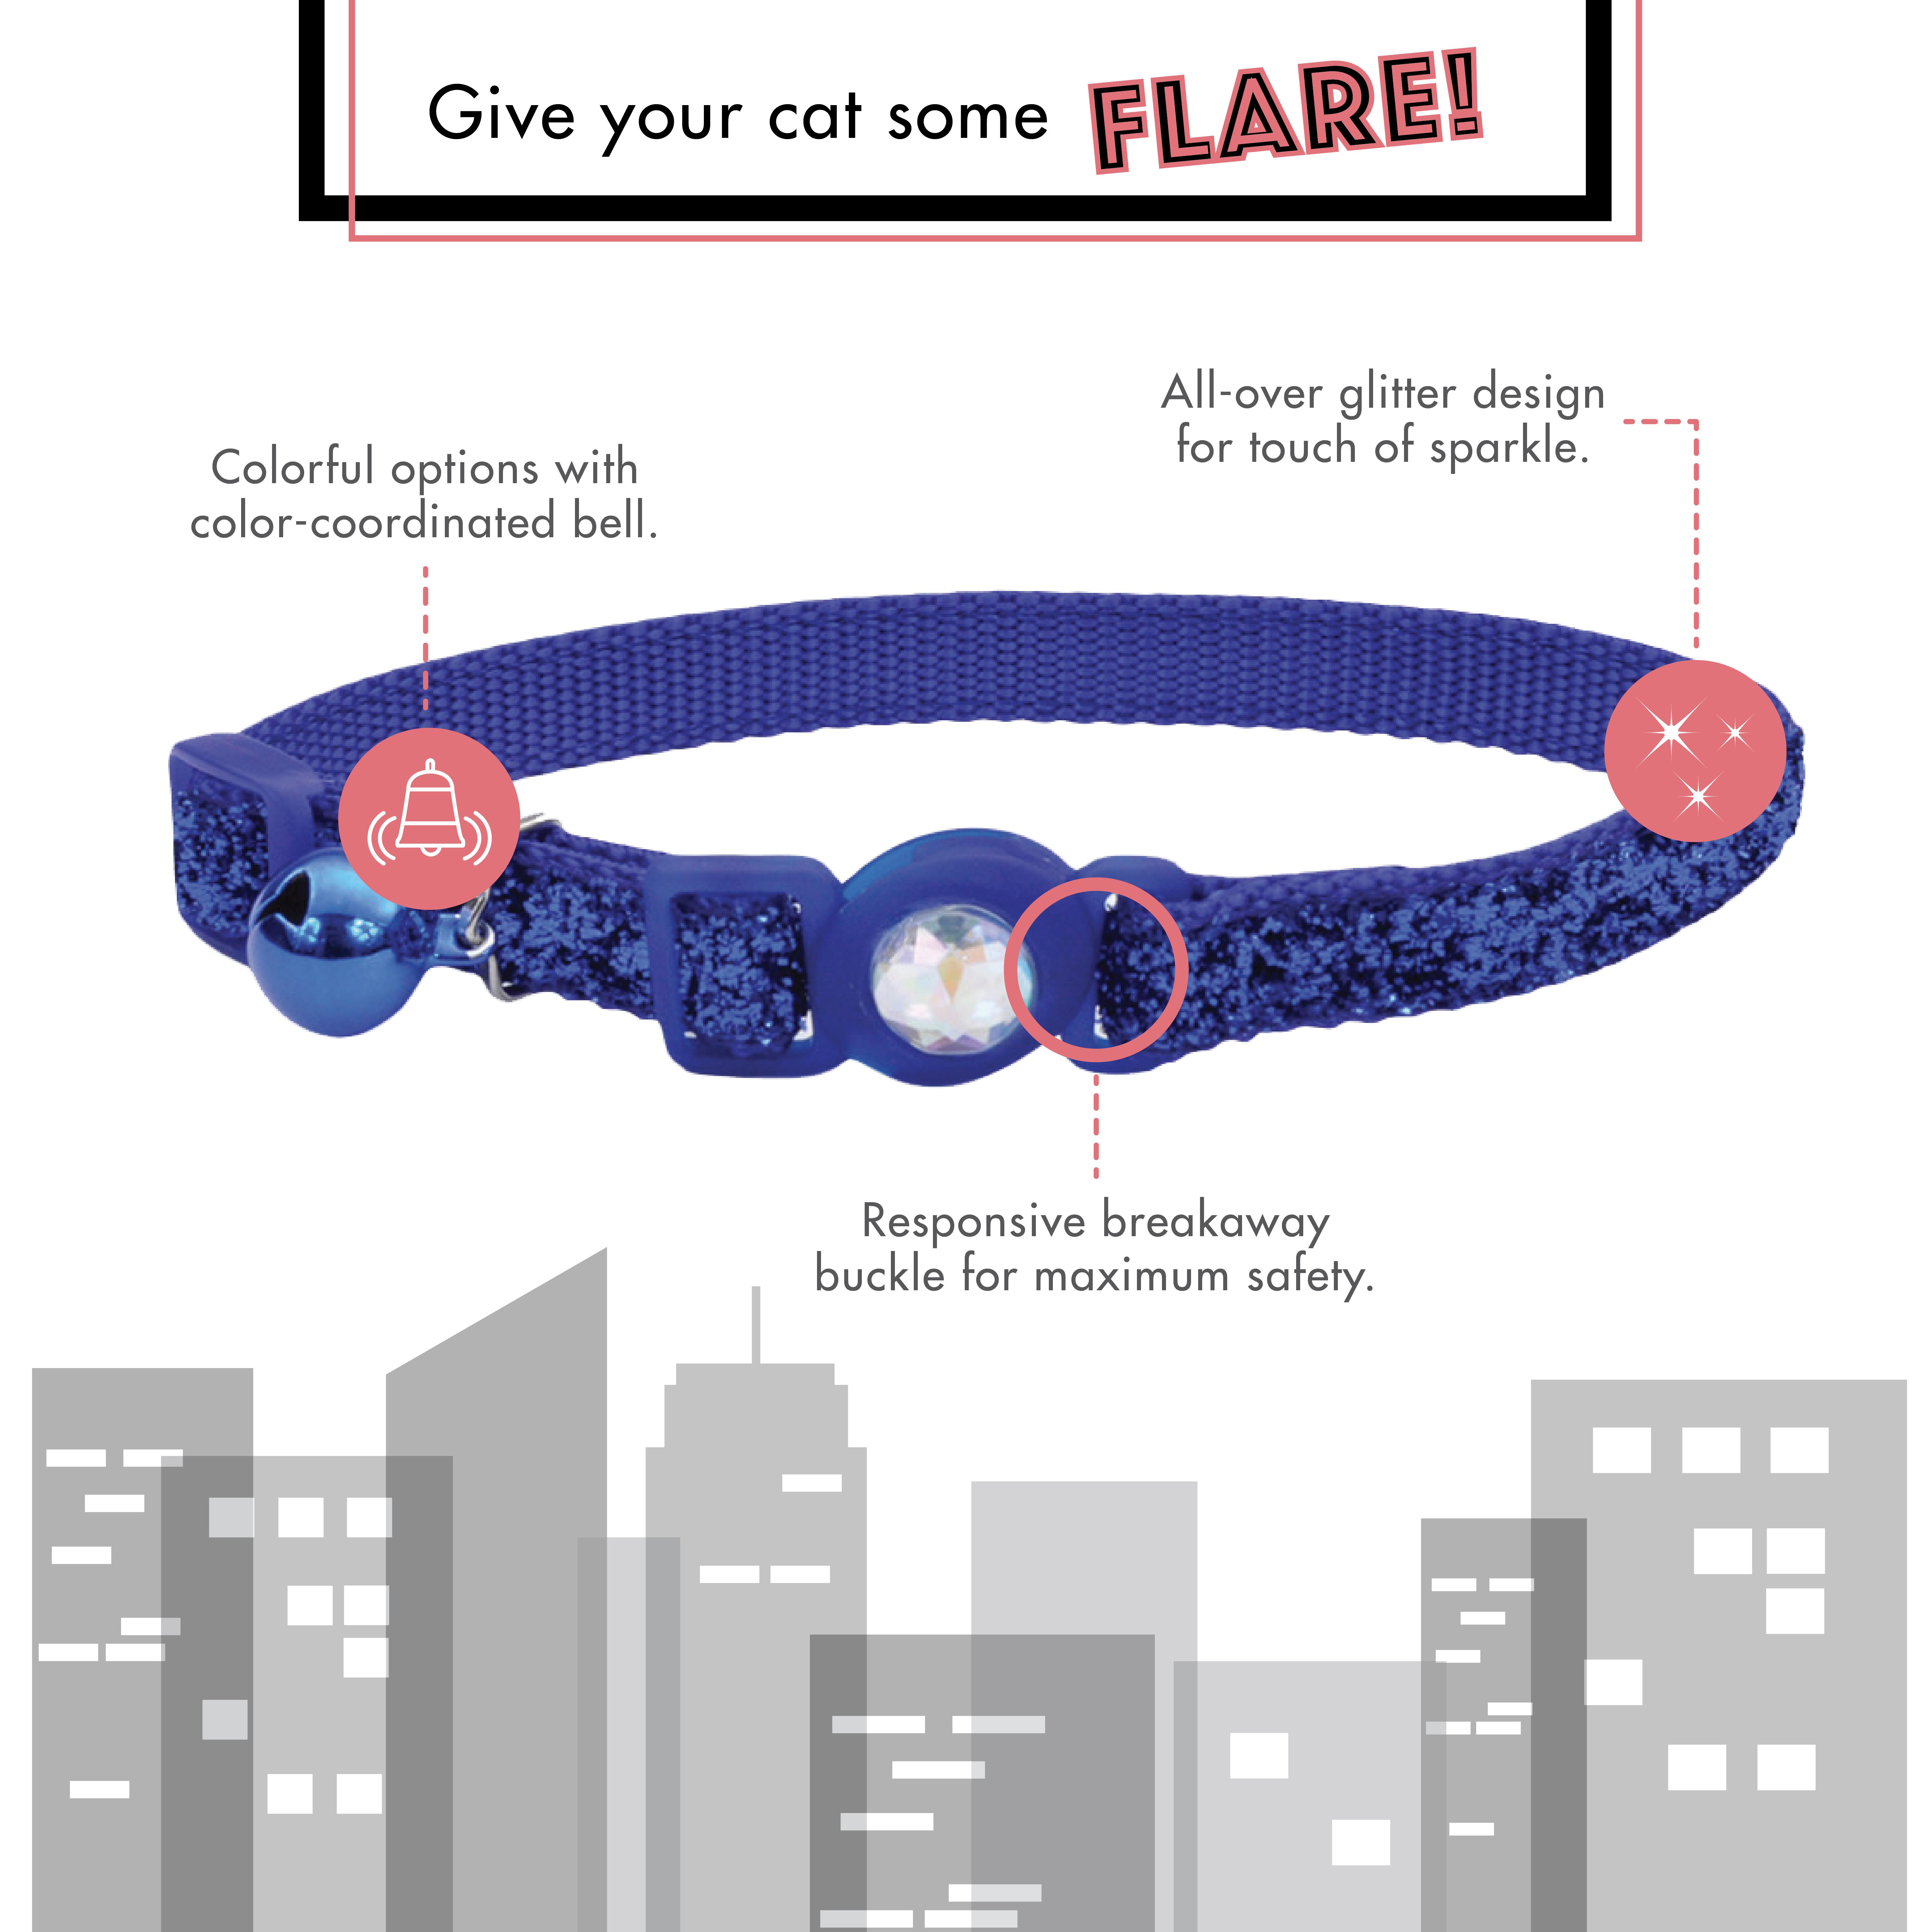 Safe Cat® Jeweled Buckle Adjustable Breakaway Cat Collar with Glitter Overlay